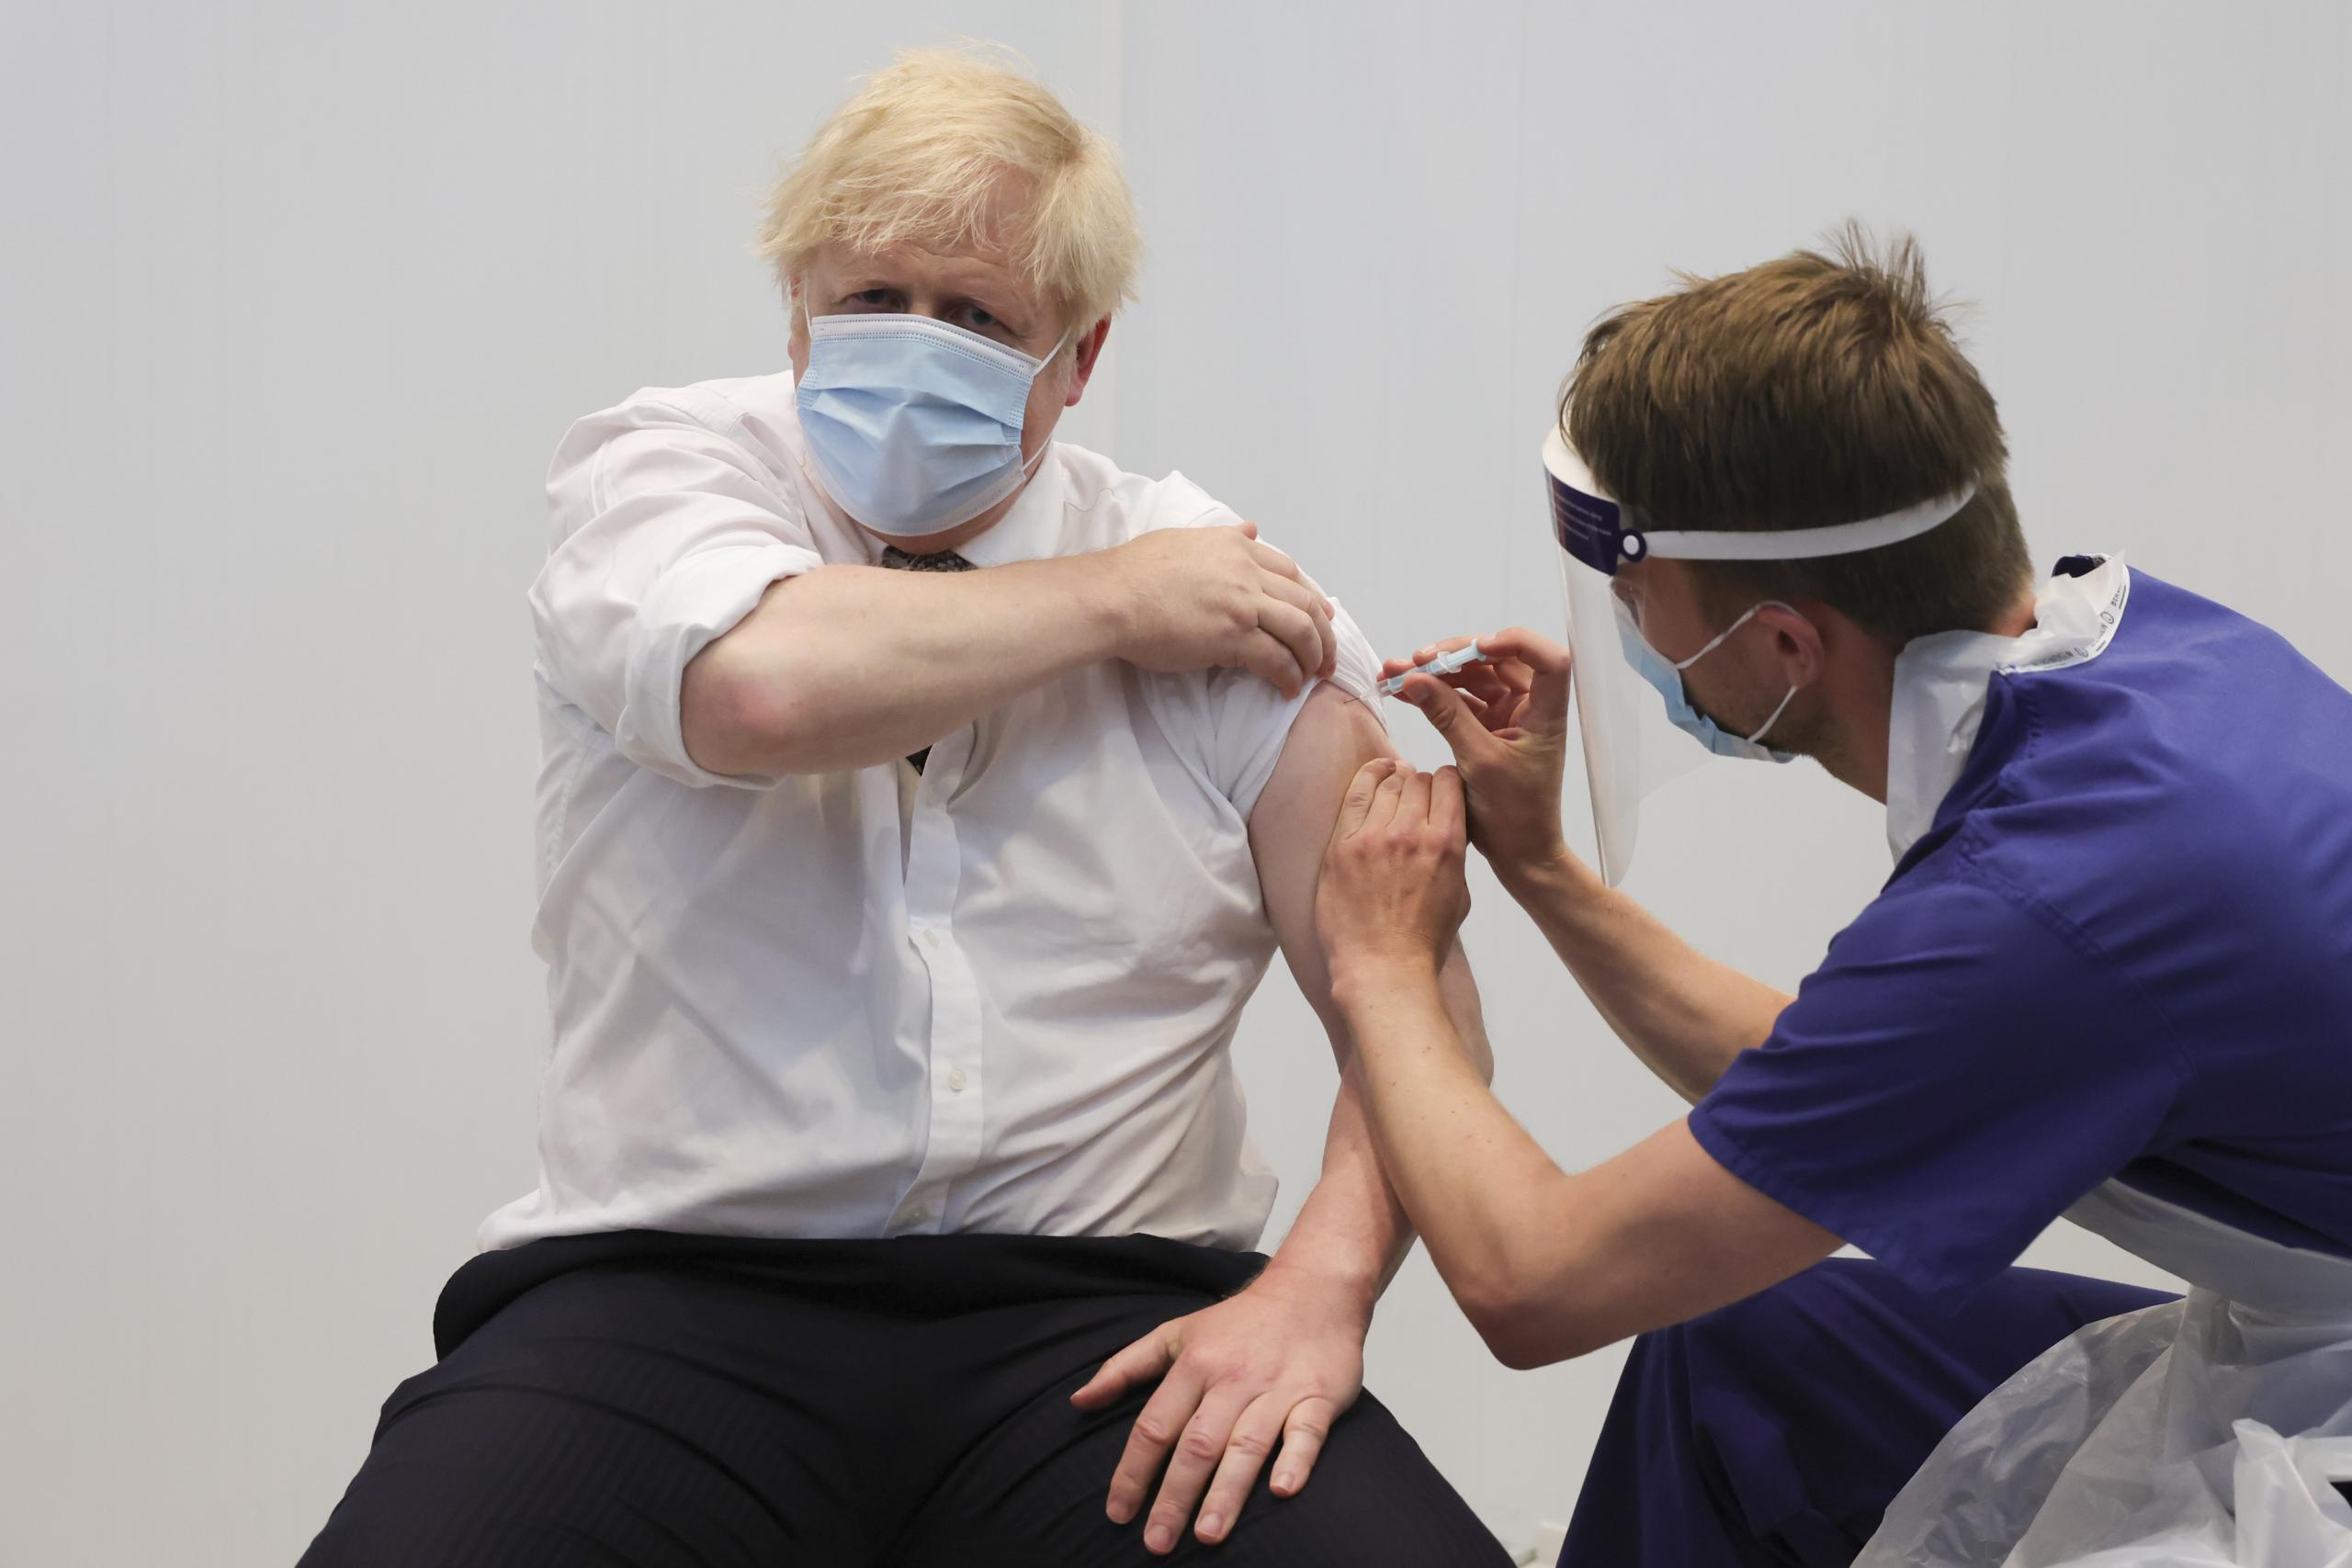 COVID-19 Vaccination in the U.K.